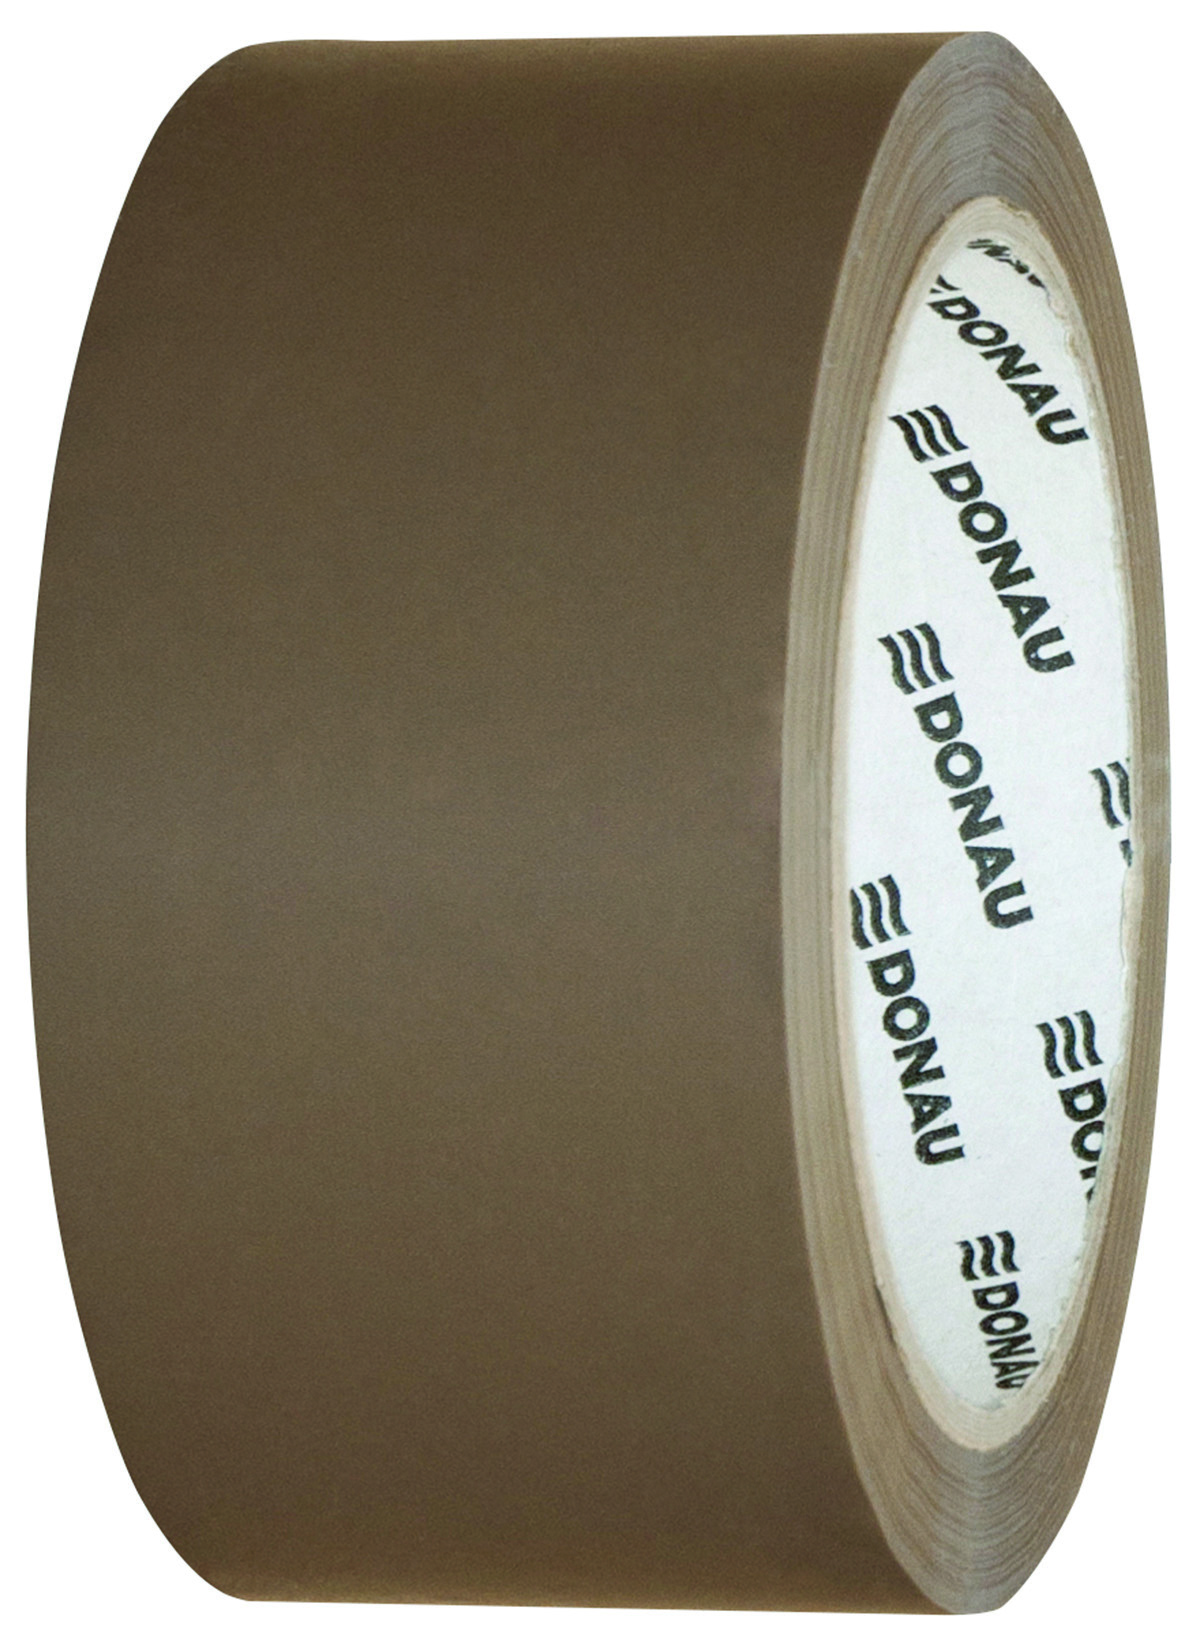 Banda adeziva, maro, 48mm x 66 m, 46 microni, pe baza de solvent, Donau